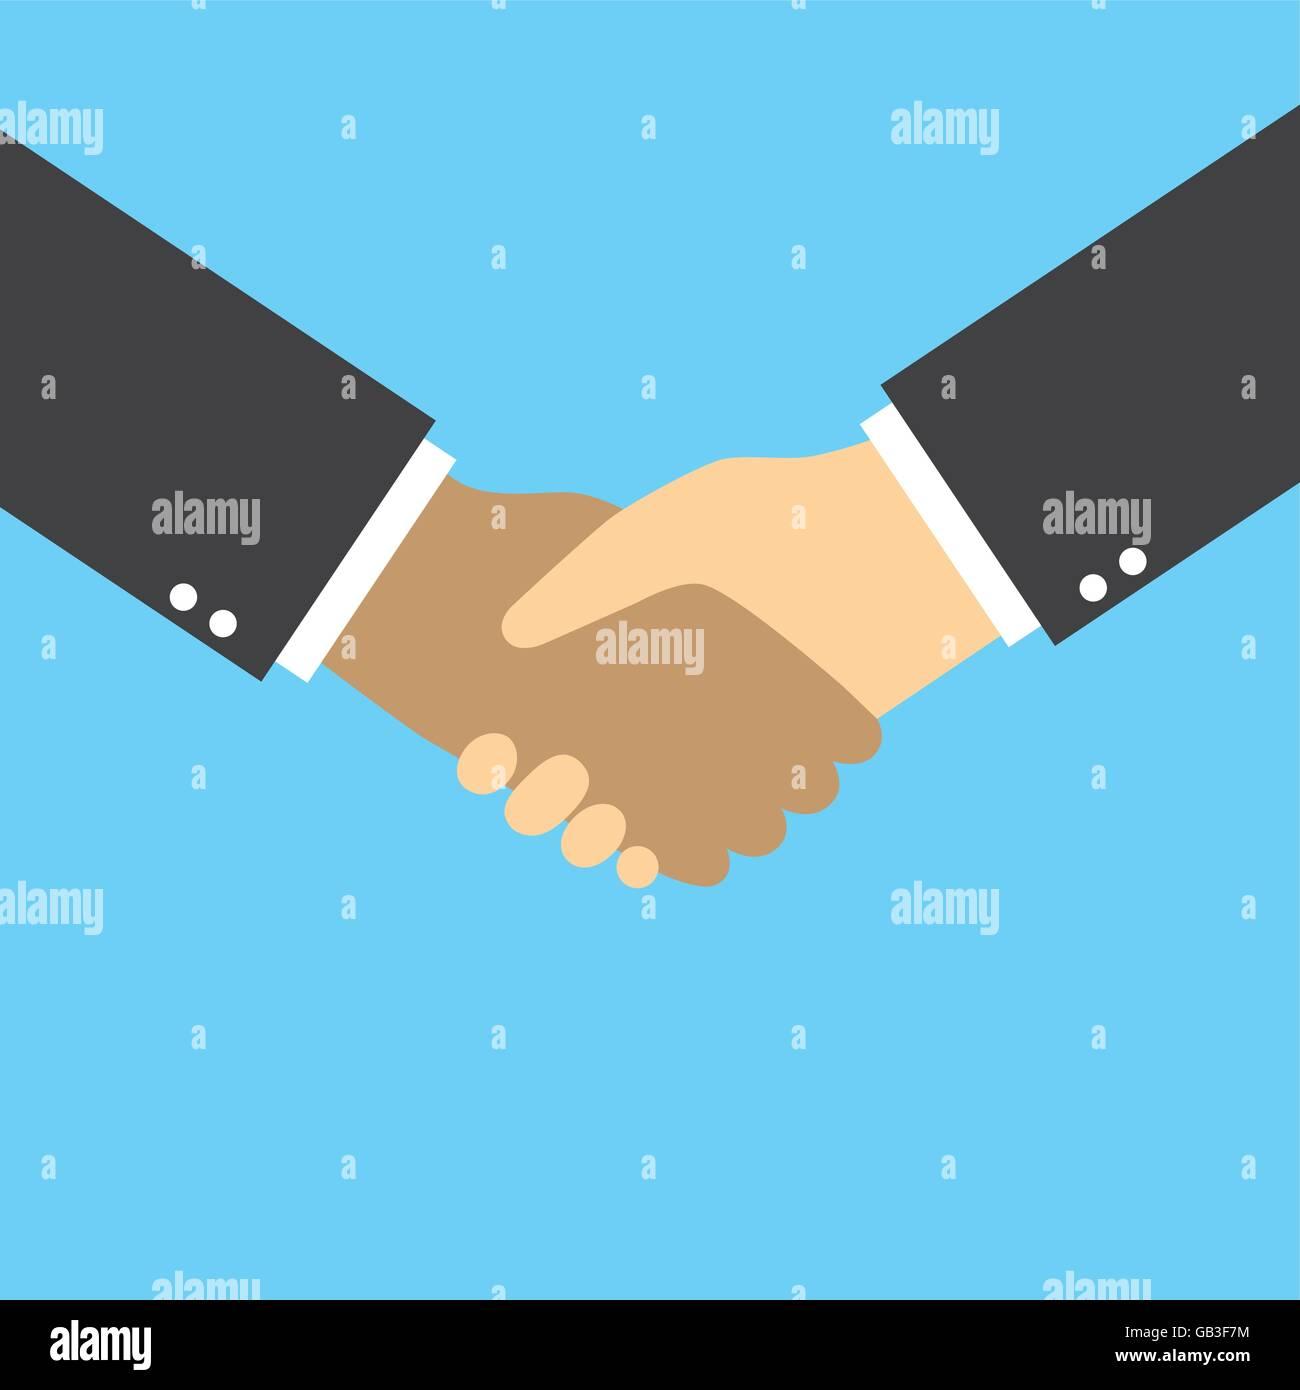 Business Handshake Vektor Grafik-Design für Kooperation ...